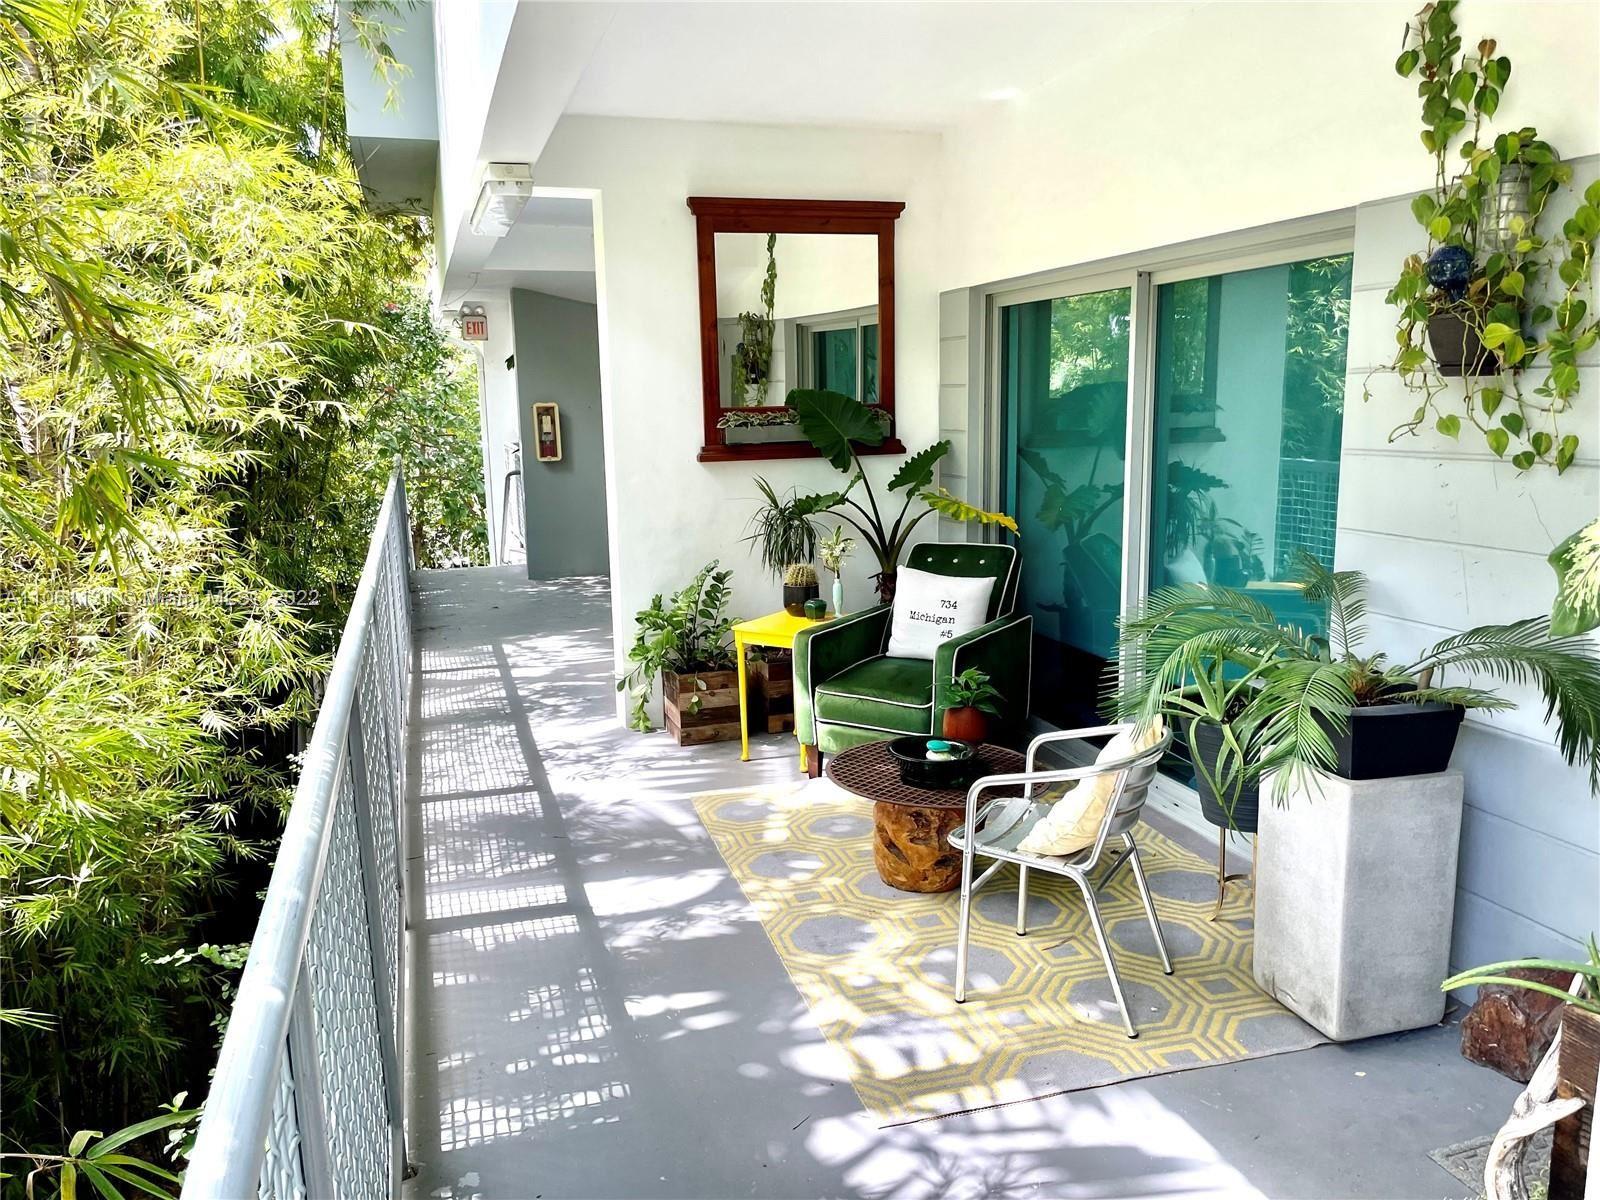 734 Michigan Ave #6, Miami Beach, FL 33139 - #: A11061131